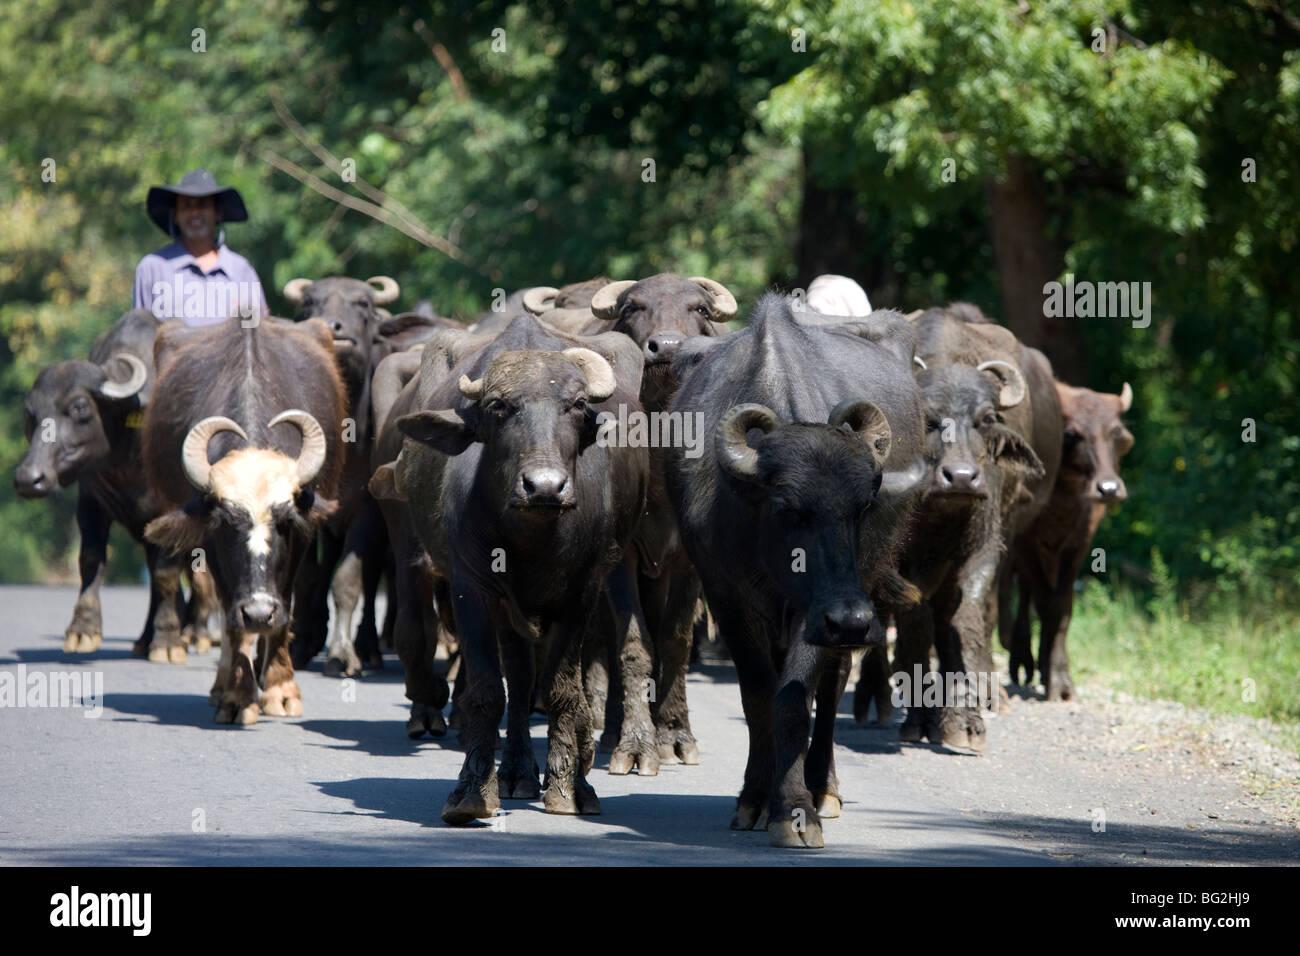 Buffalo's walking down the road in Tanamalwila, Sri Lanka - Stock Image